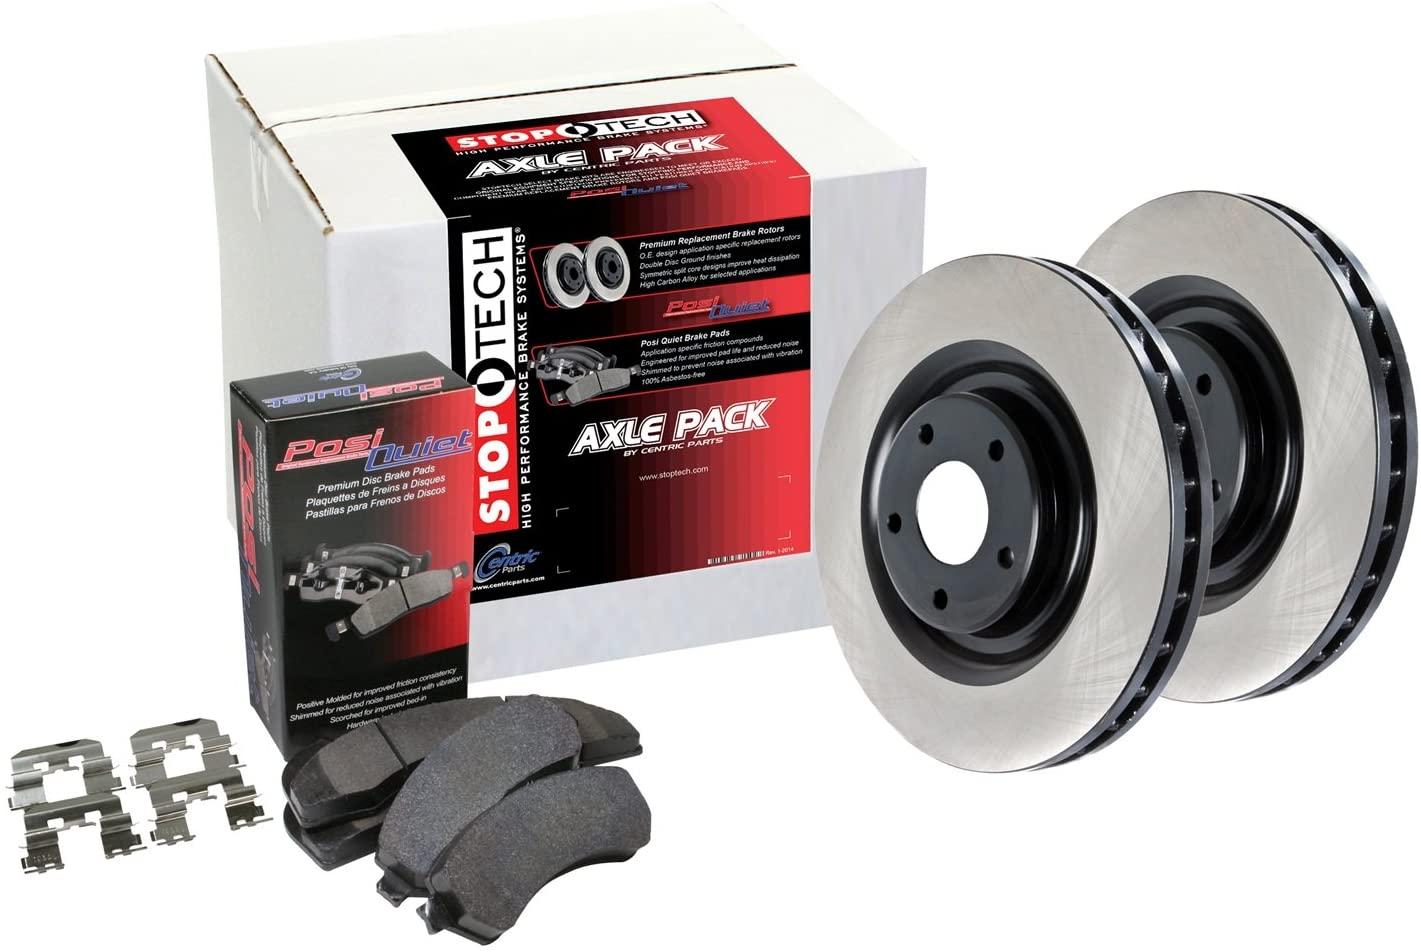 StopTech 909.47504 Rear Brake Kit (Preferred Pack)